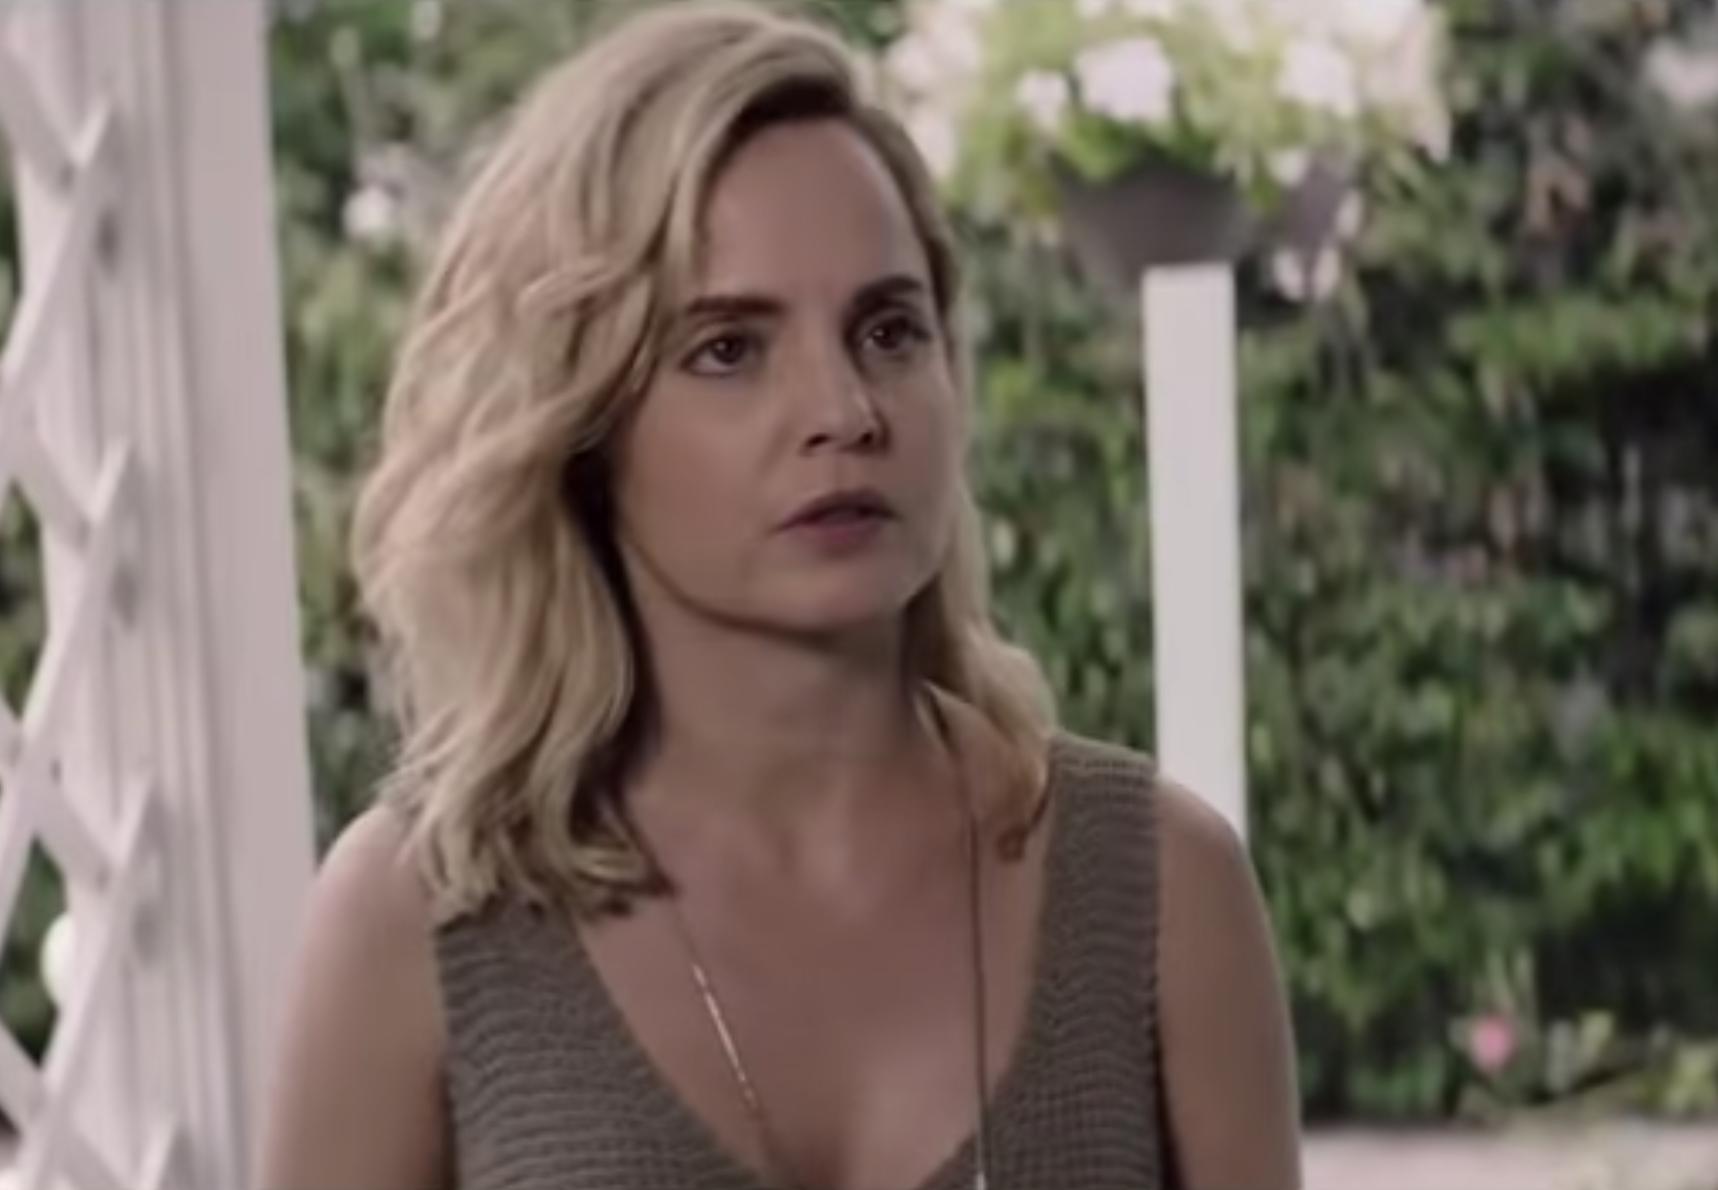 New Nicole Brown Simpson movie starring Mena Suvari criticized for its bizarre premise: 'Did O.J. write this script?'